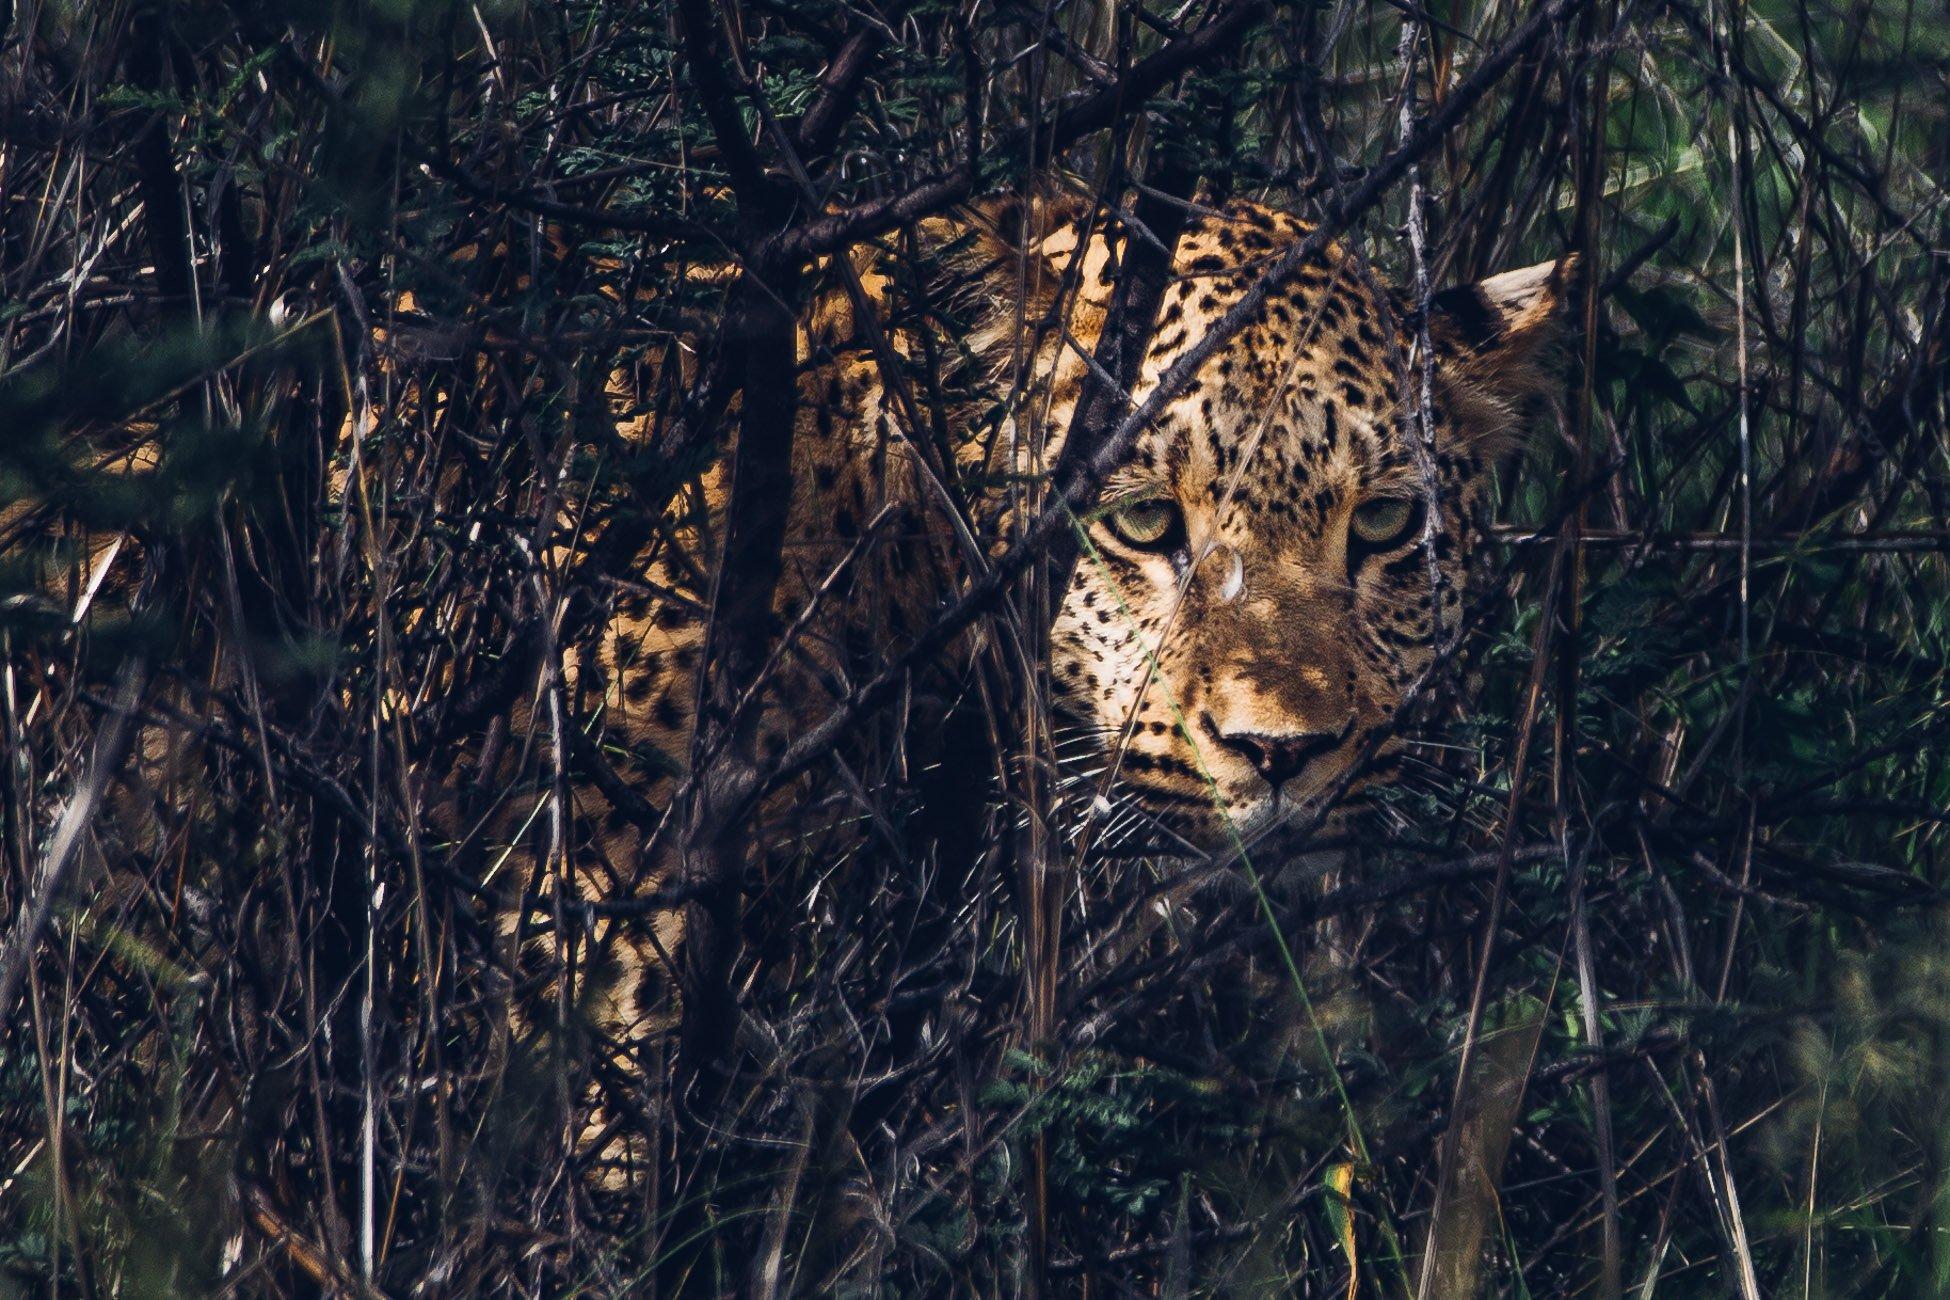 Leopard at a Safari in Namibia